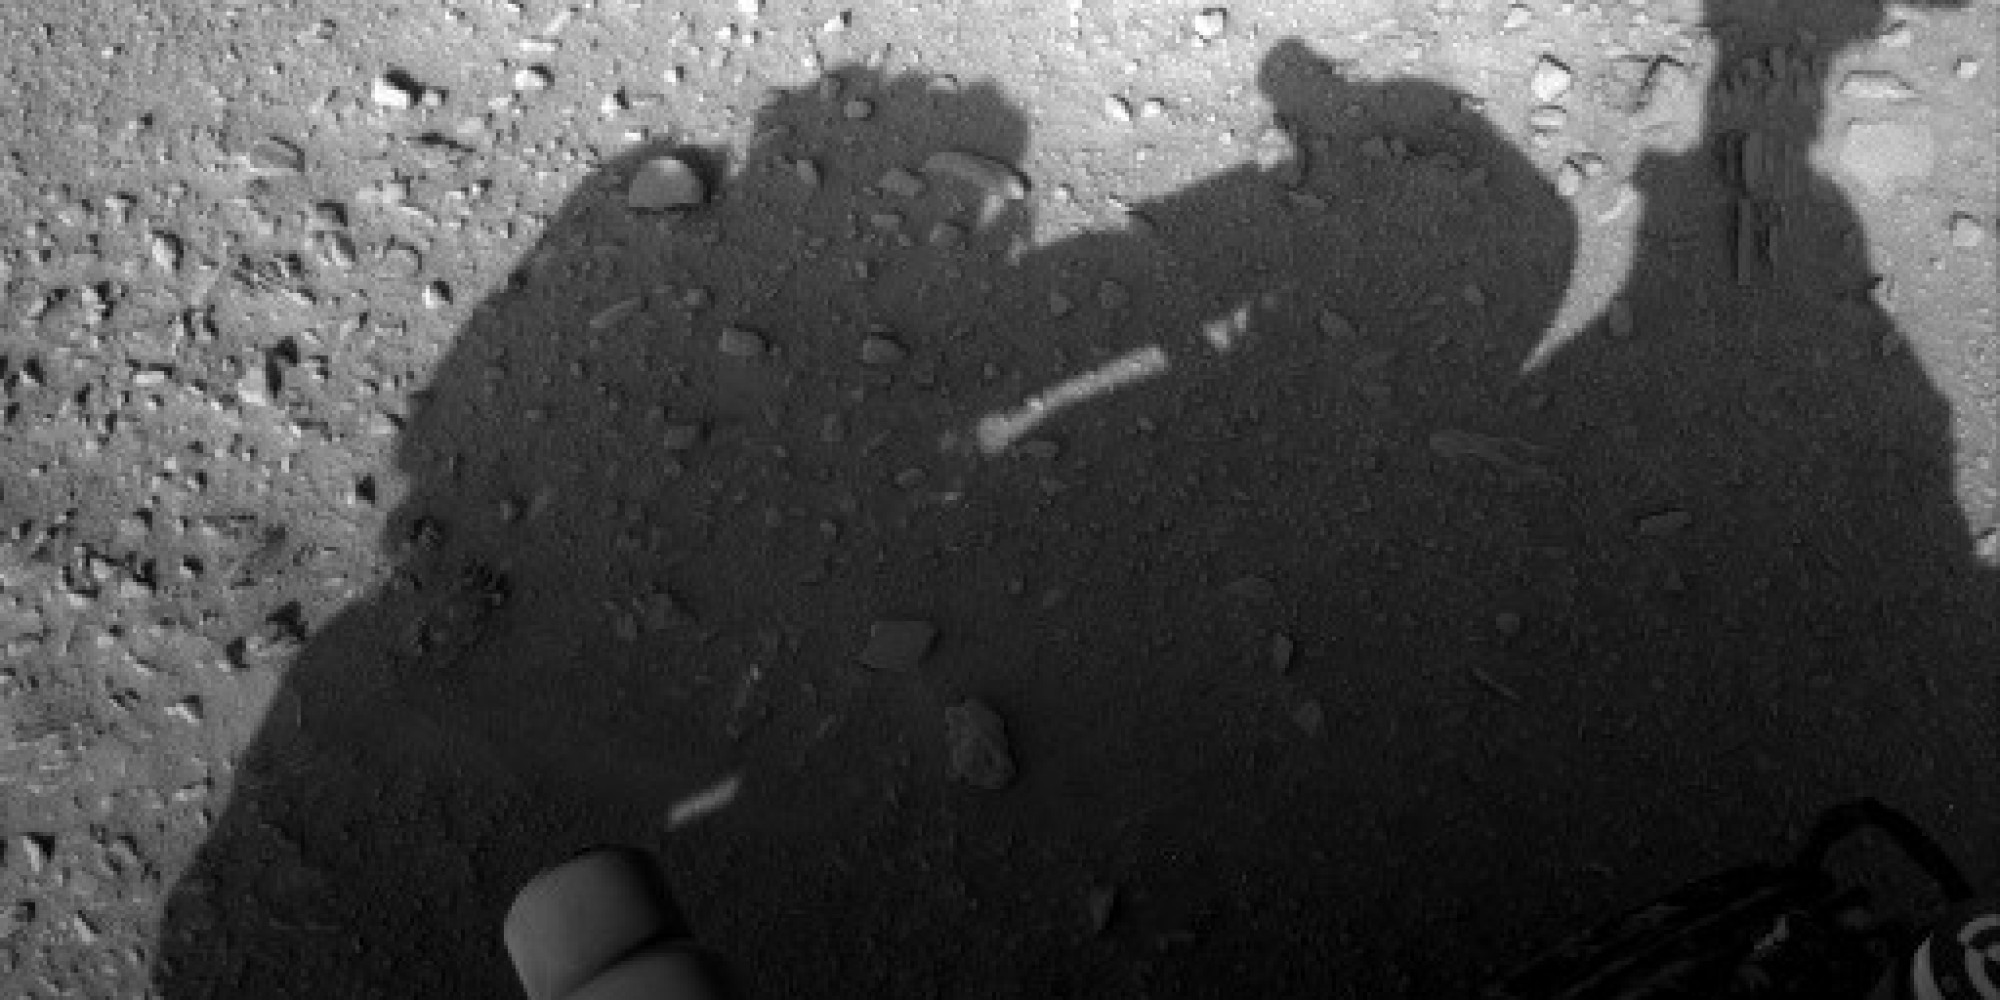 mars man rover - photo #20